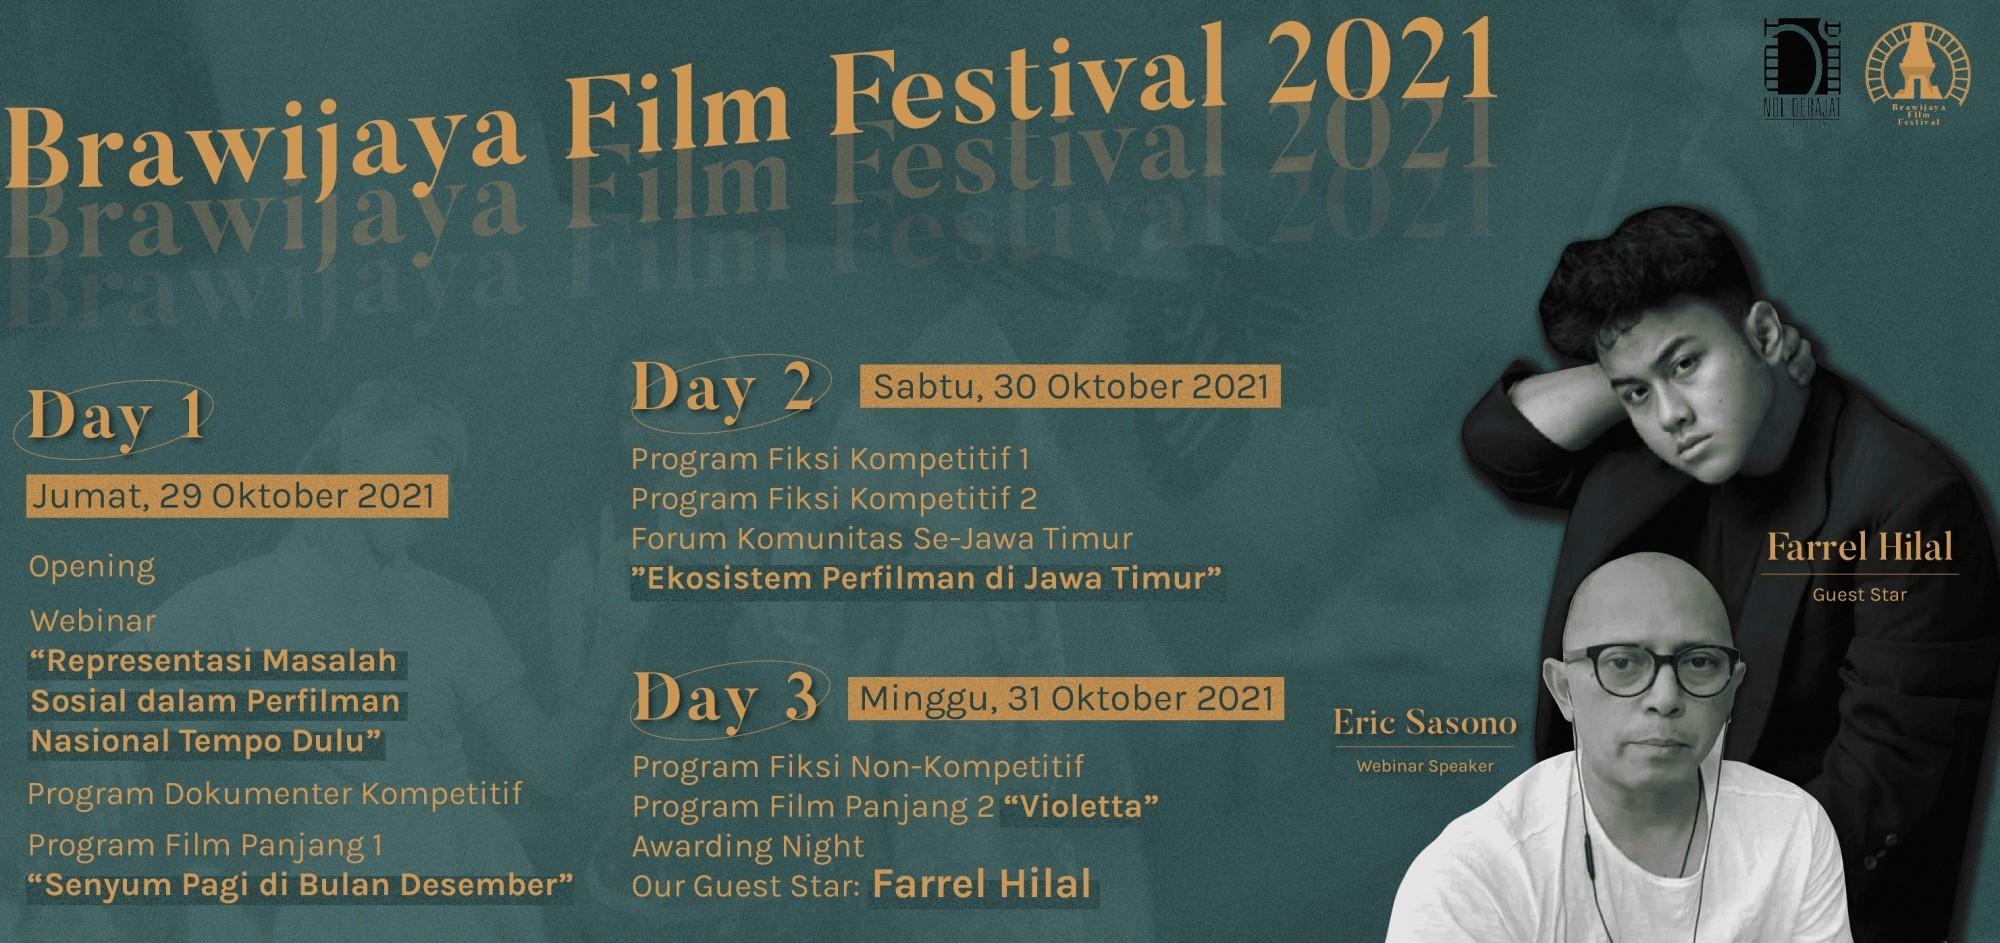 Brawijaya Film Festival